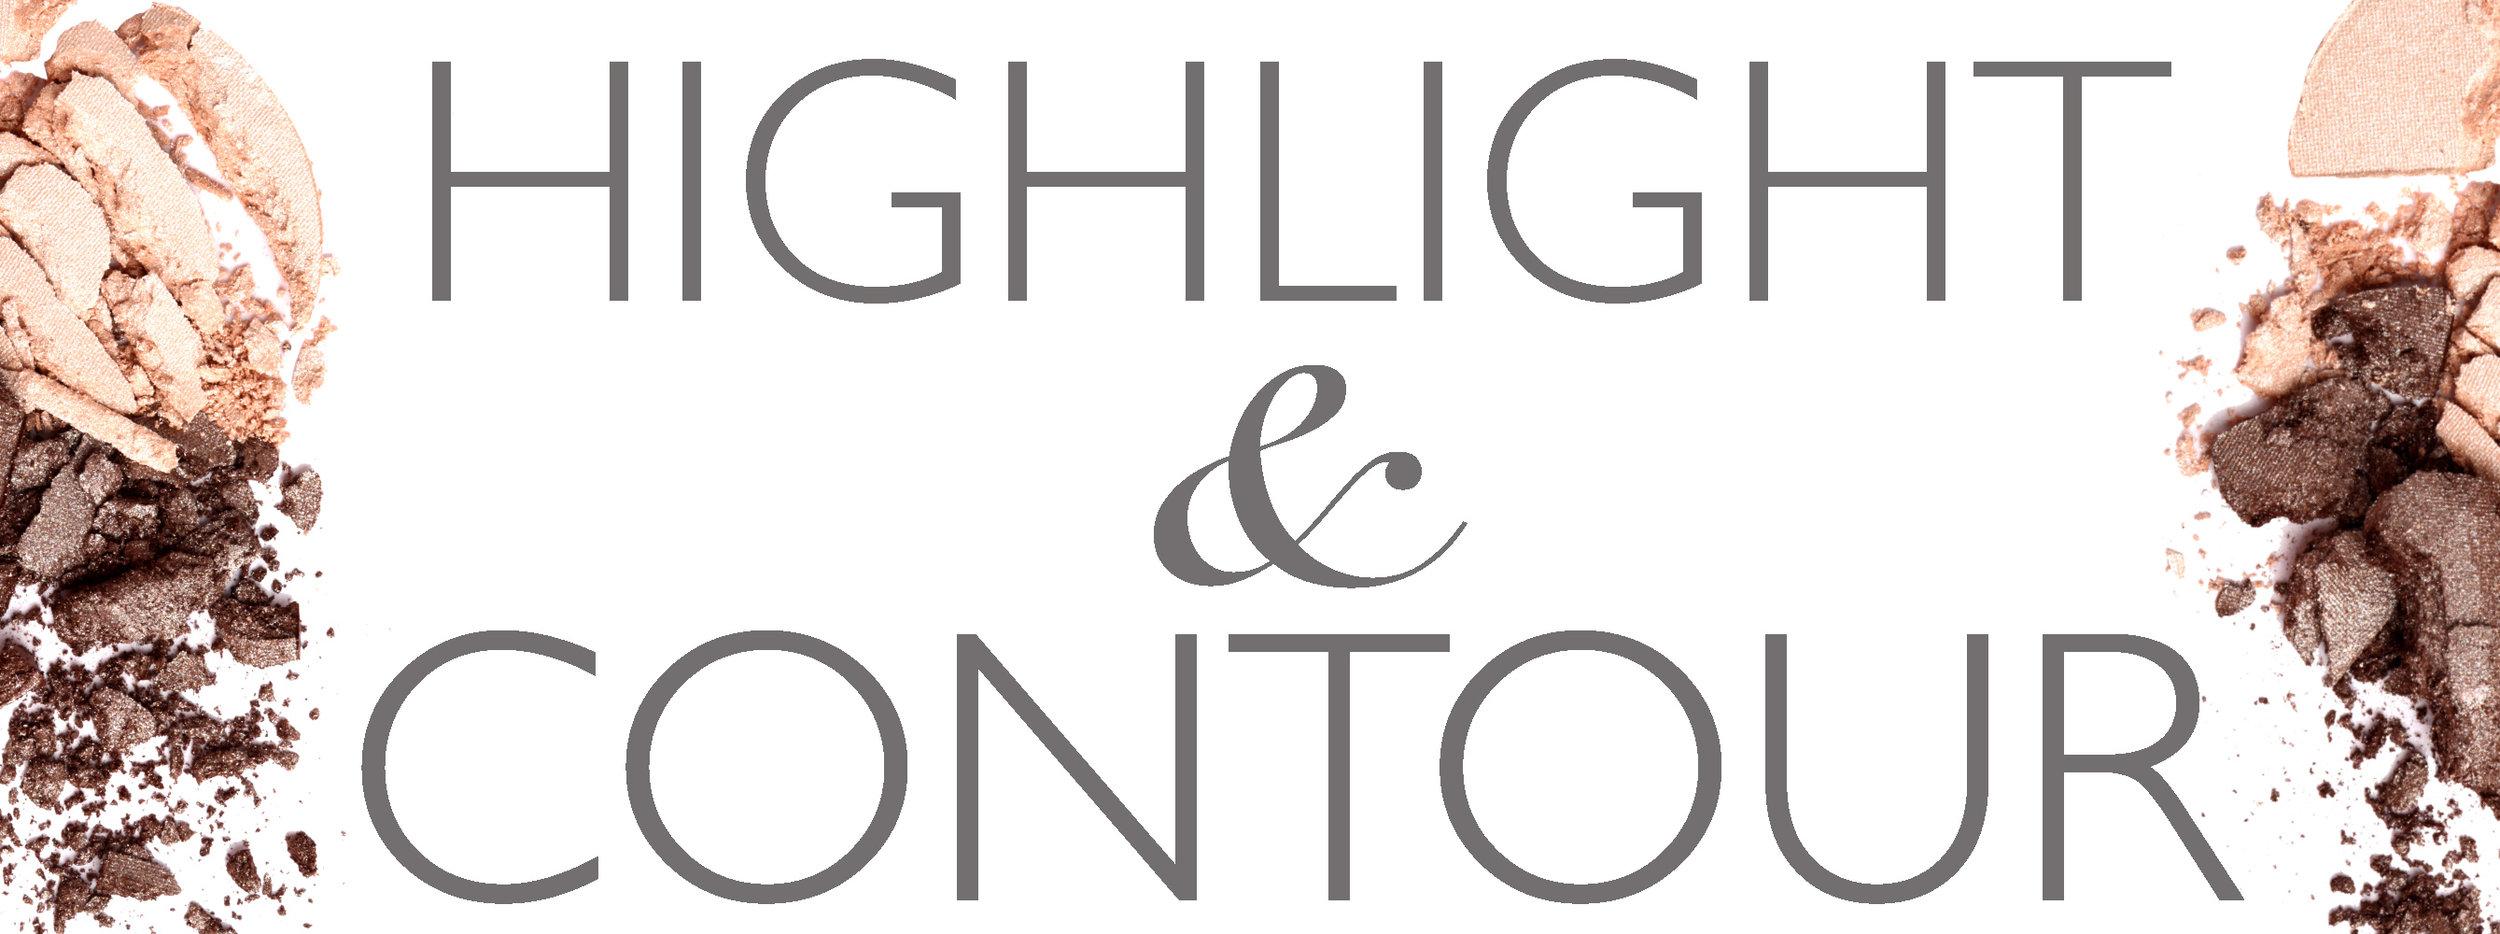 HIGHLIGHT & CONTOUR.jpg